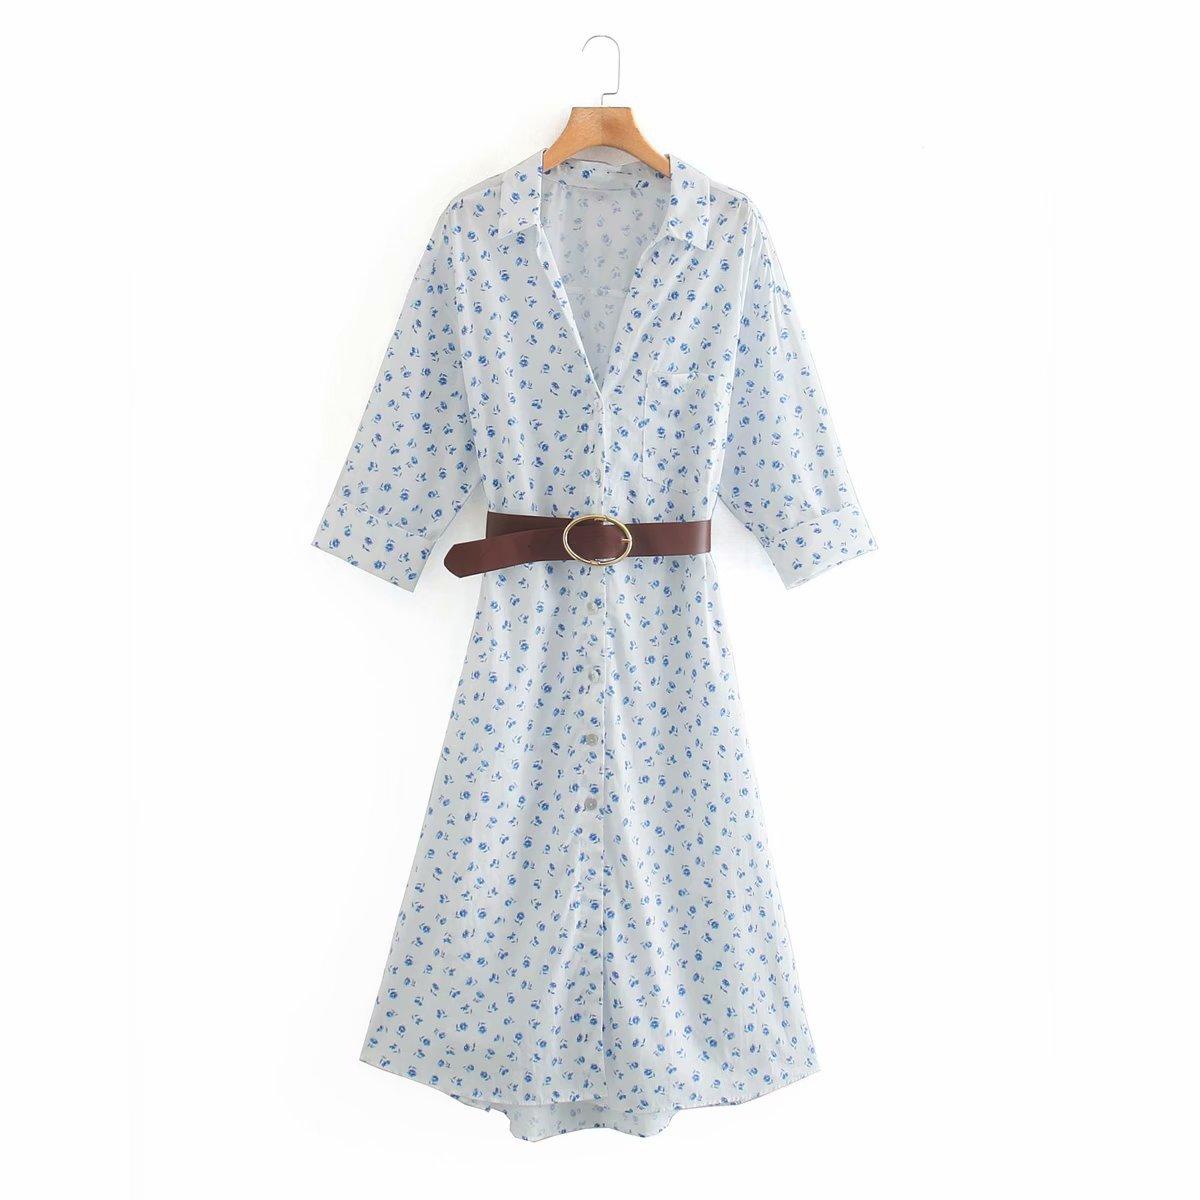 NOVEDAD DE VERANO 2020 vestido blanco azul de talla grande zaraing para mujer 2020 sheining vadiming zanzeaing zafuler para mujer Lfd9700